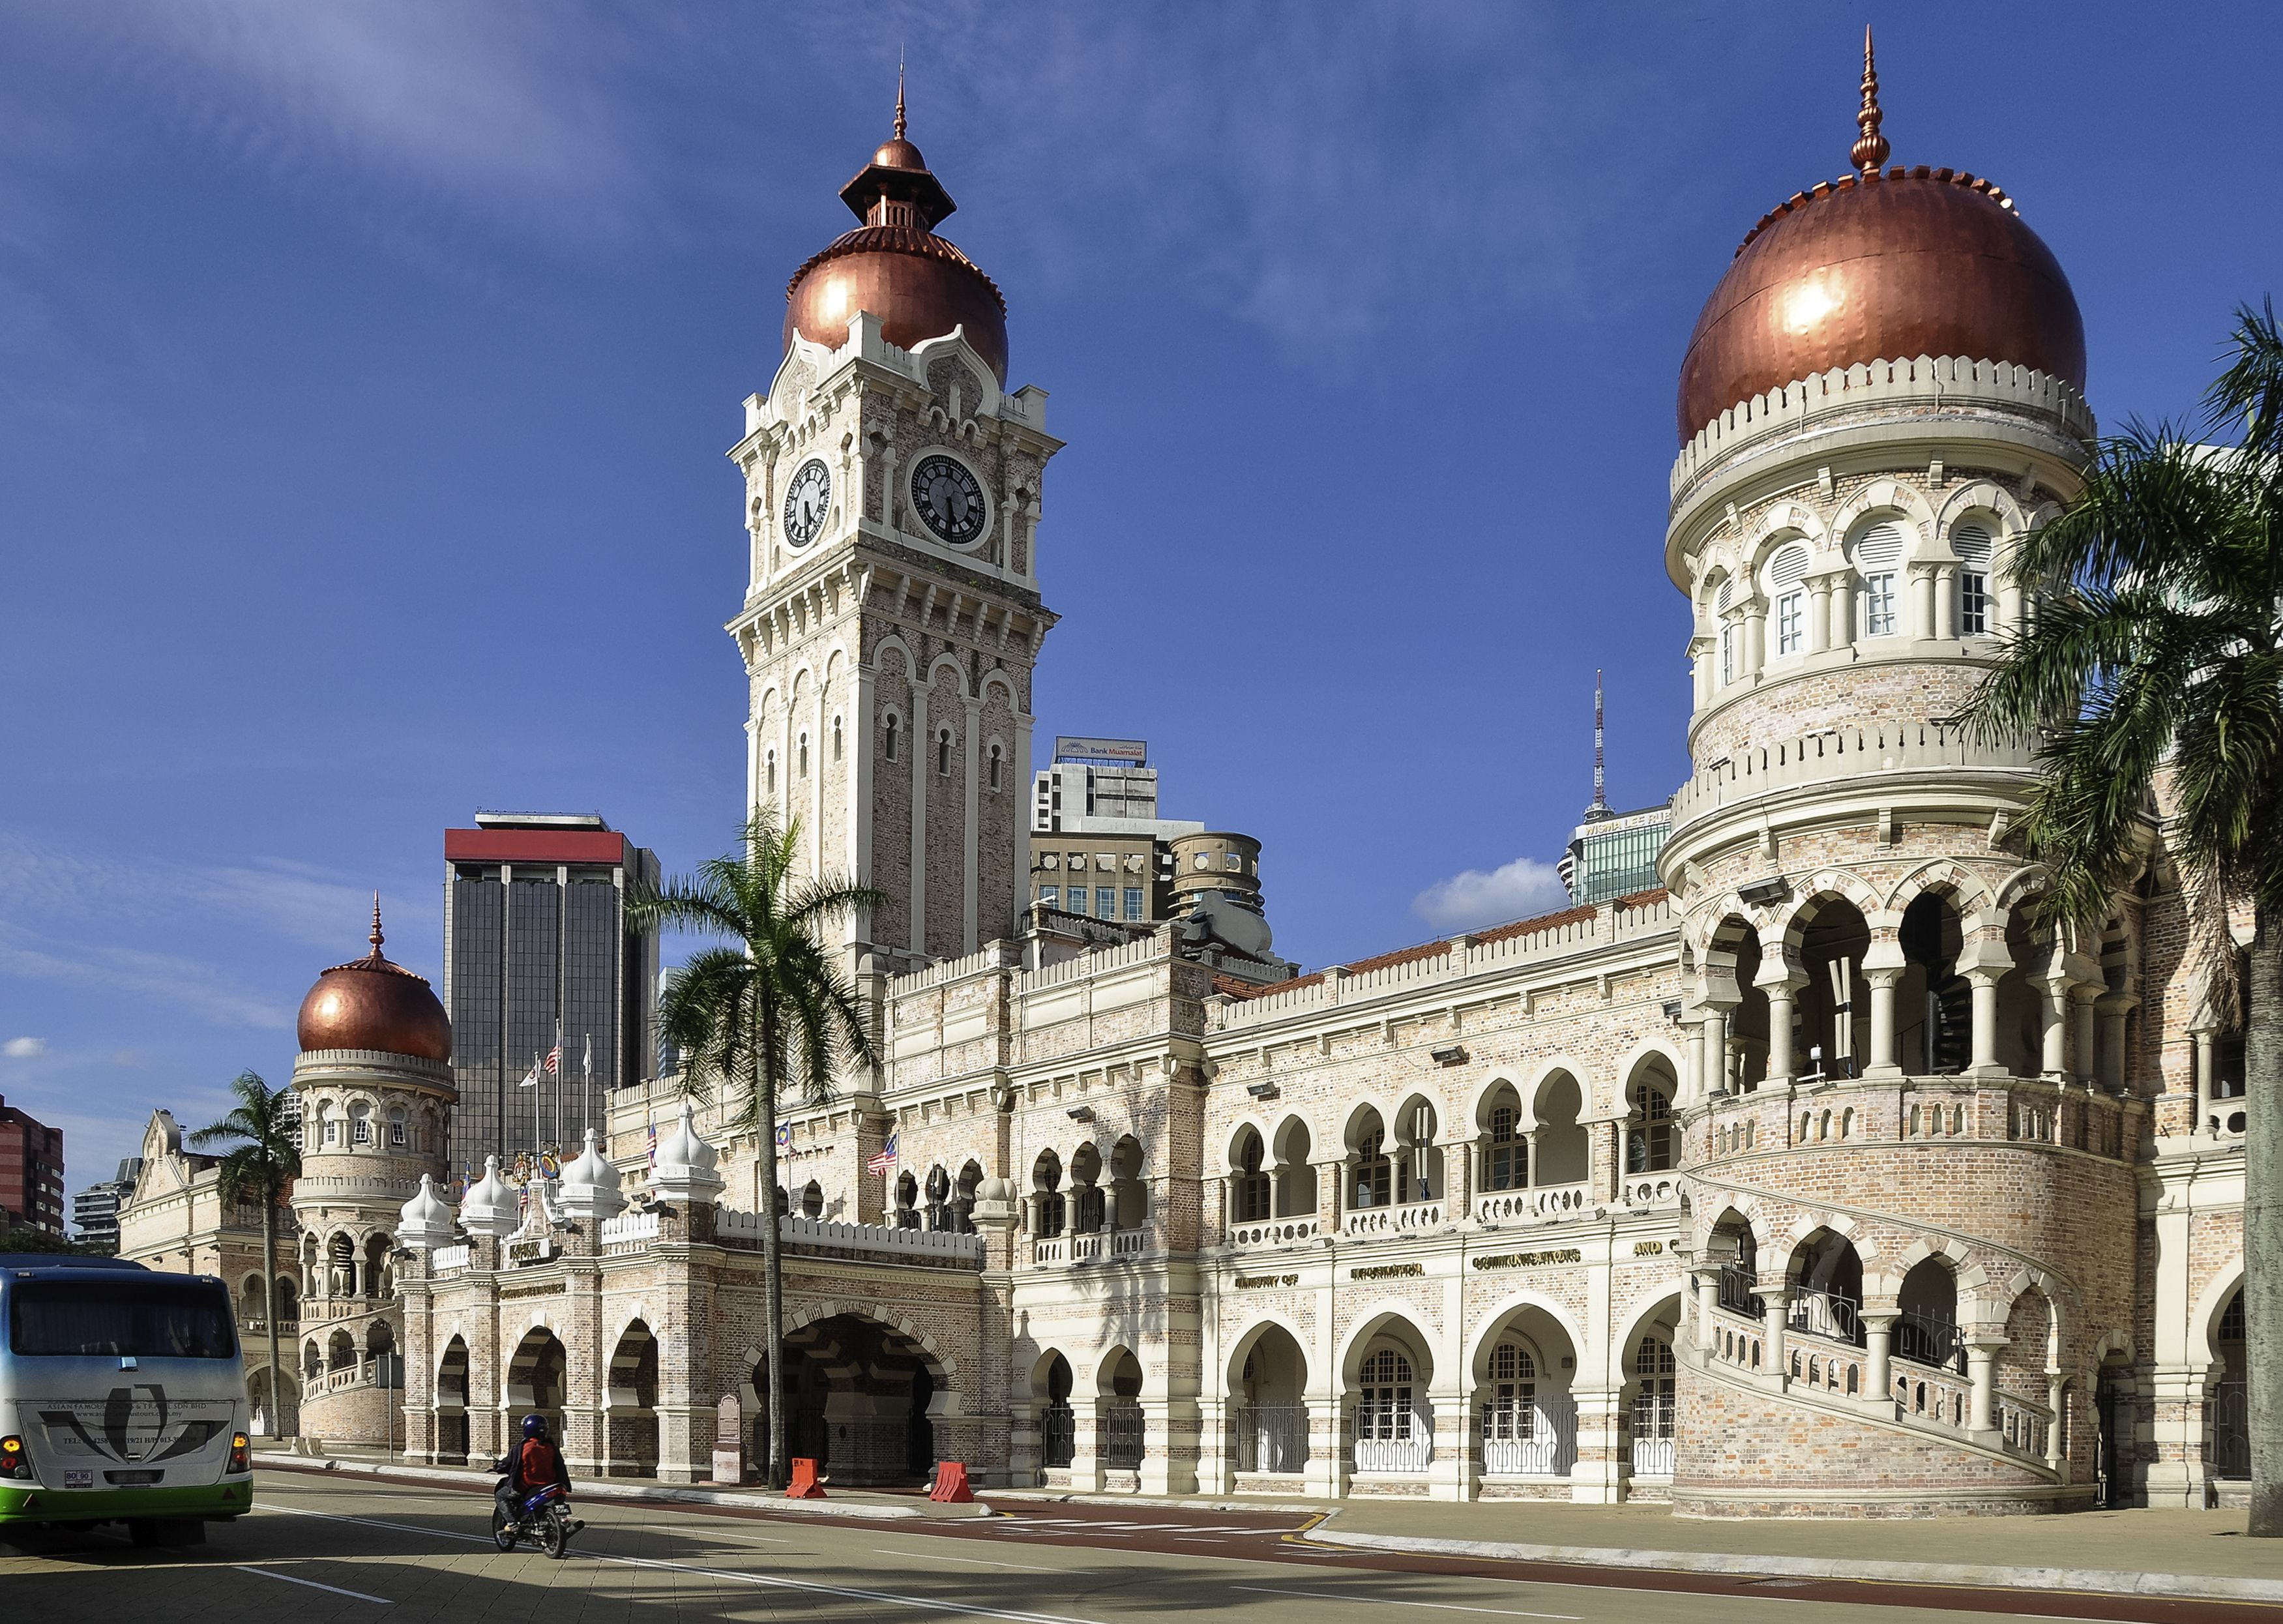 Sultan Abdul Samad Building In Kuala Lumpur Malaysia Kuala Lumpur Hotel Kuala Lumpur Kuala Lumpur City